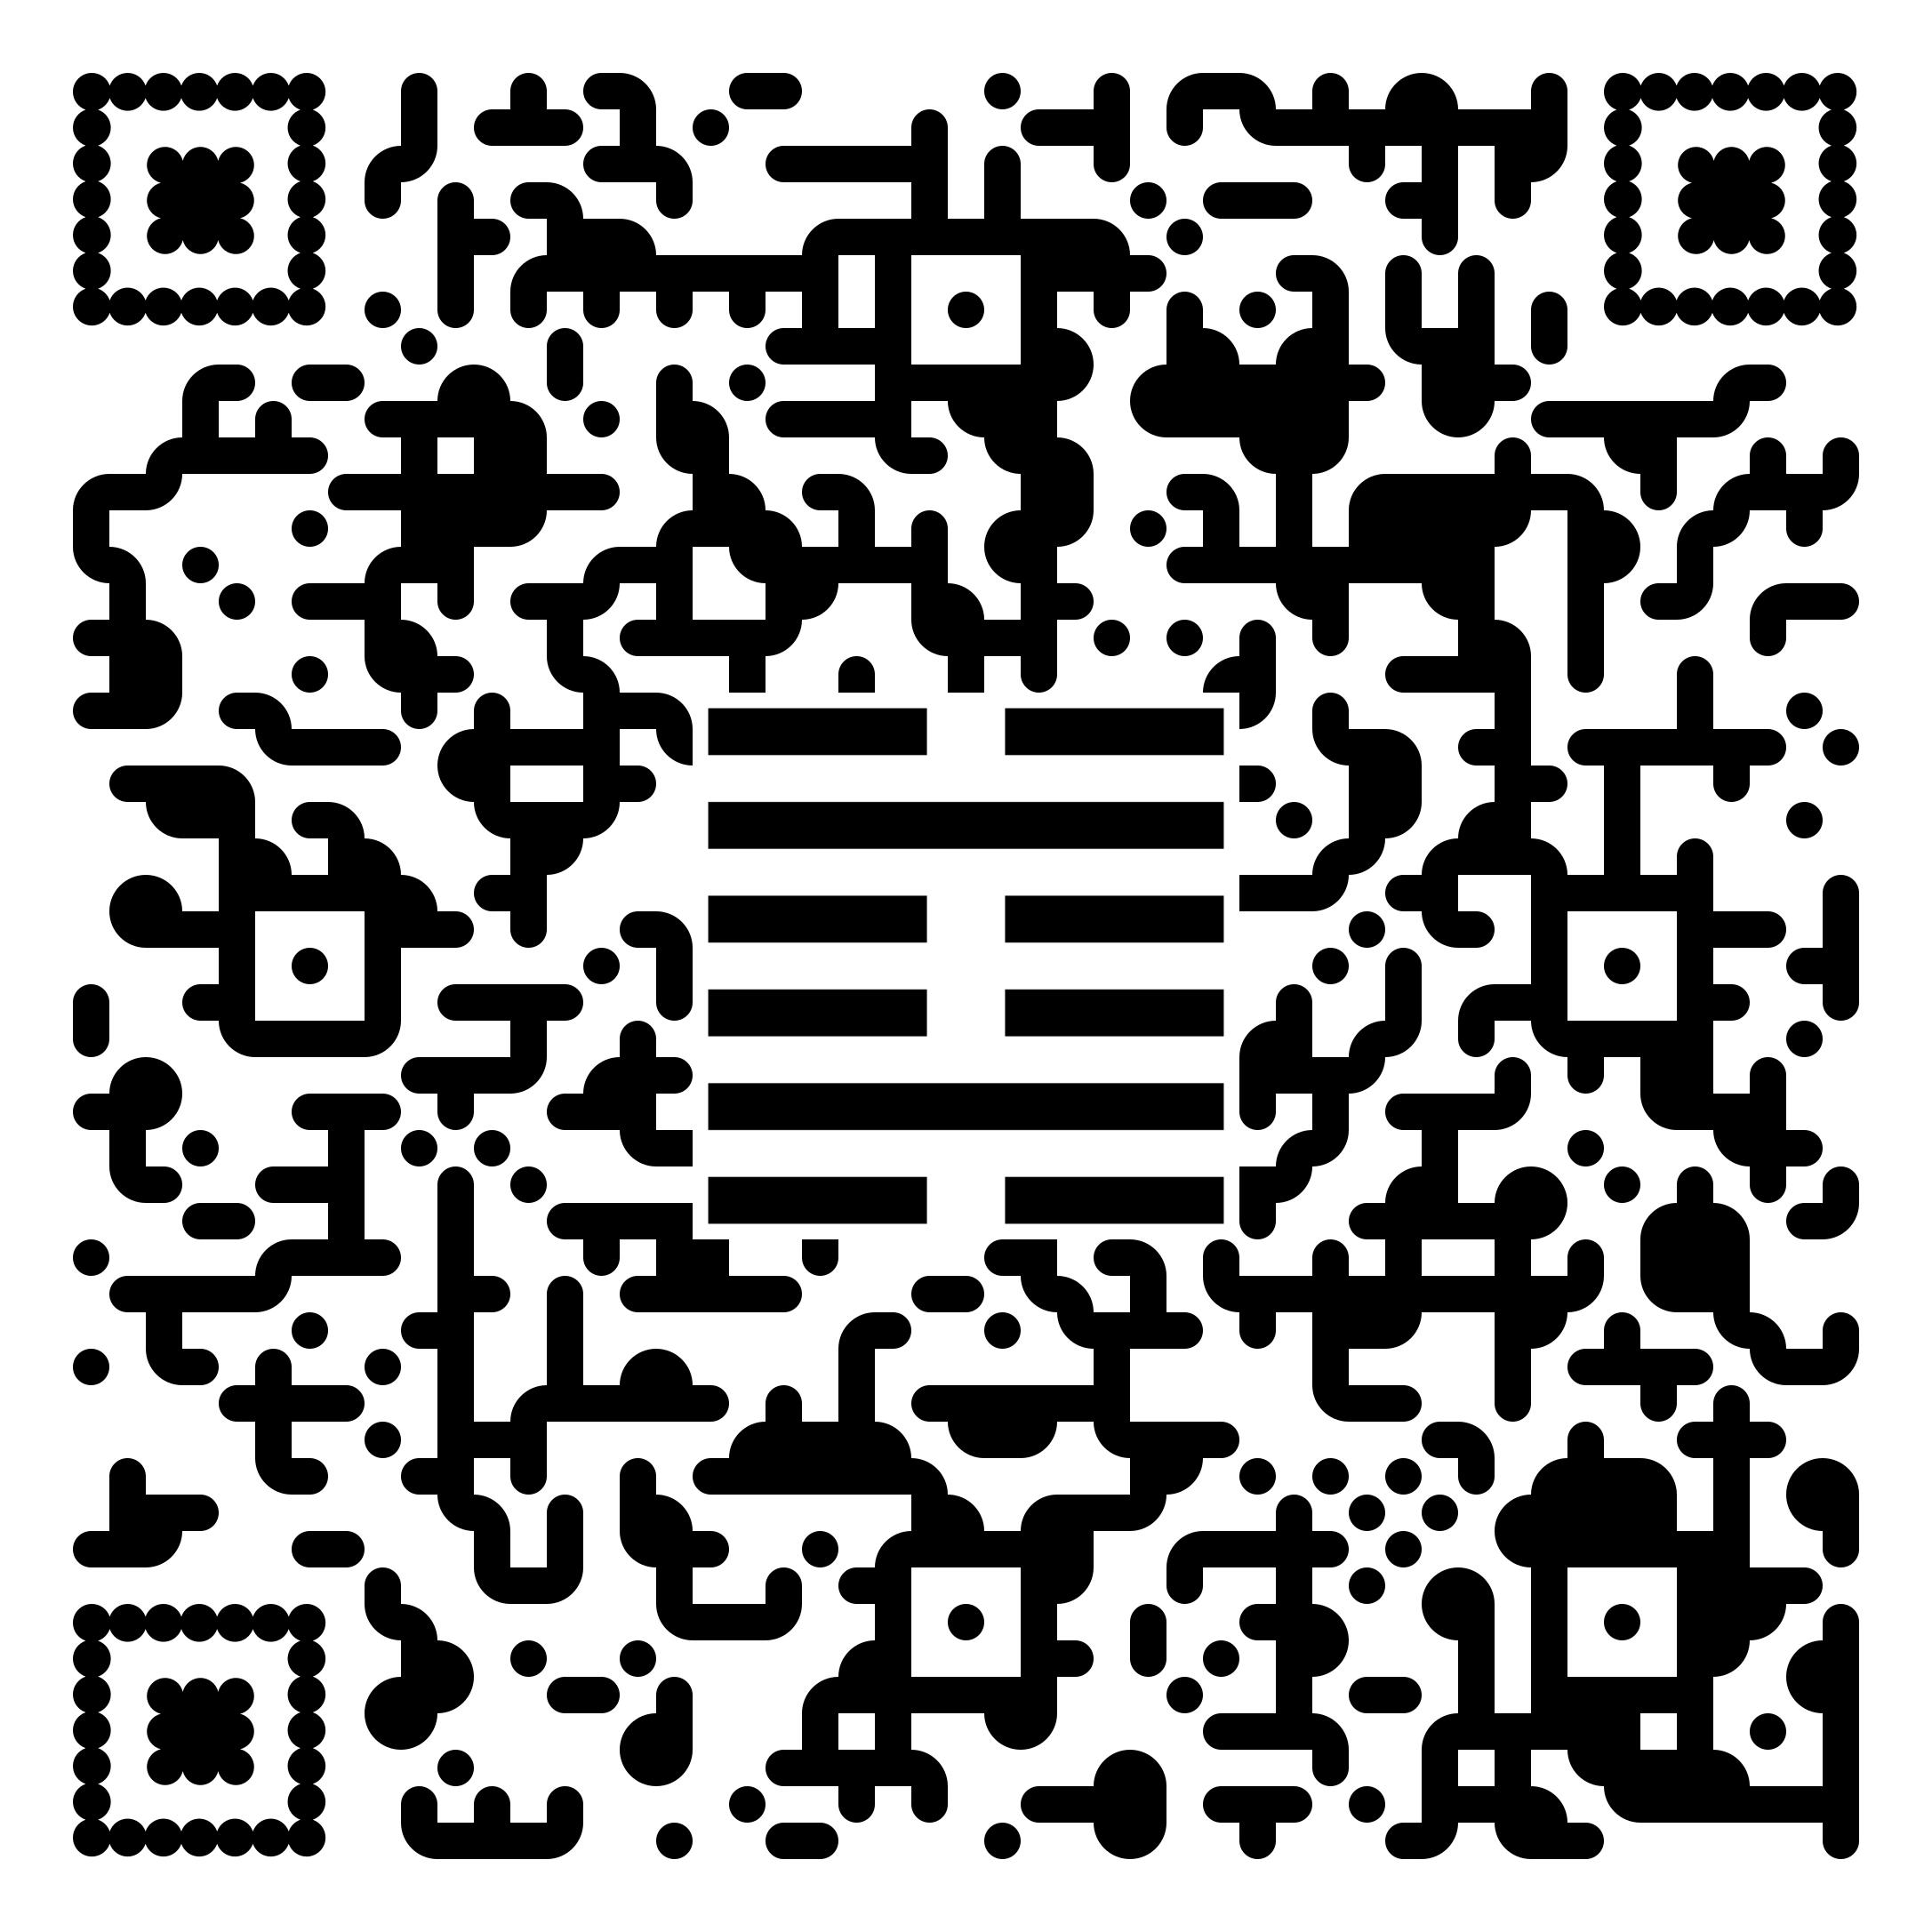 qr-code-29.png